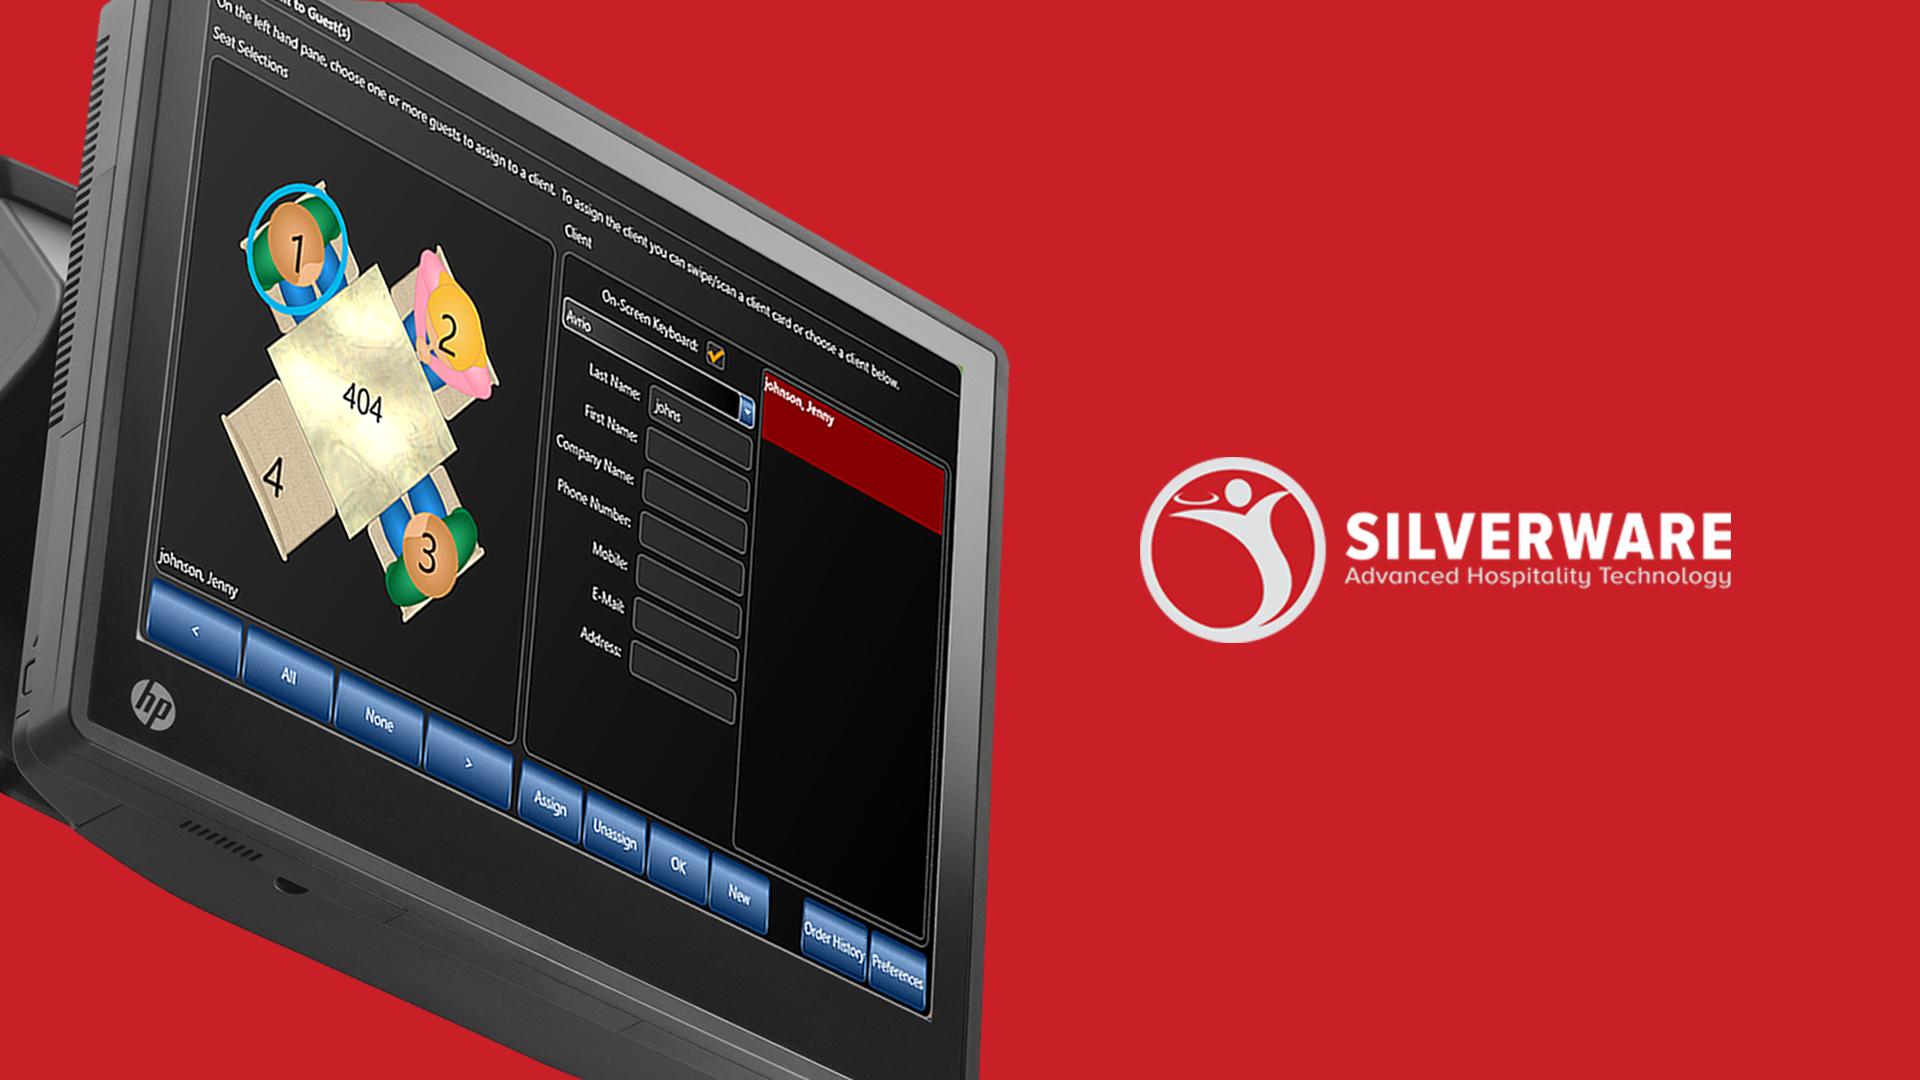 Silverware Demo - Unique Graphical Seat Selection